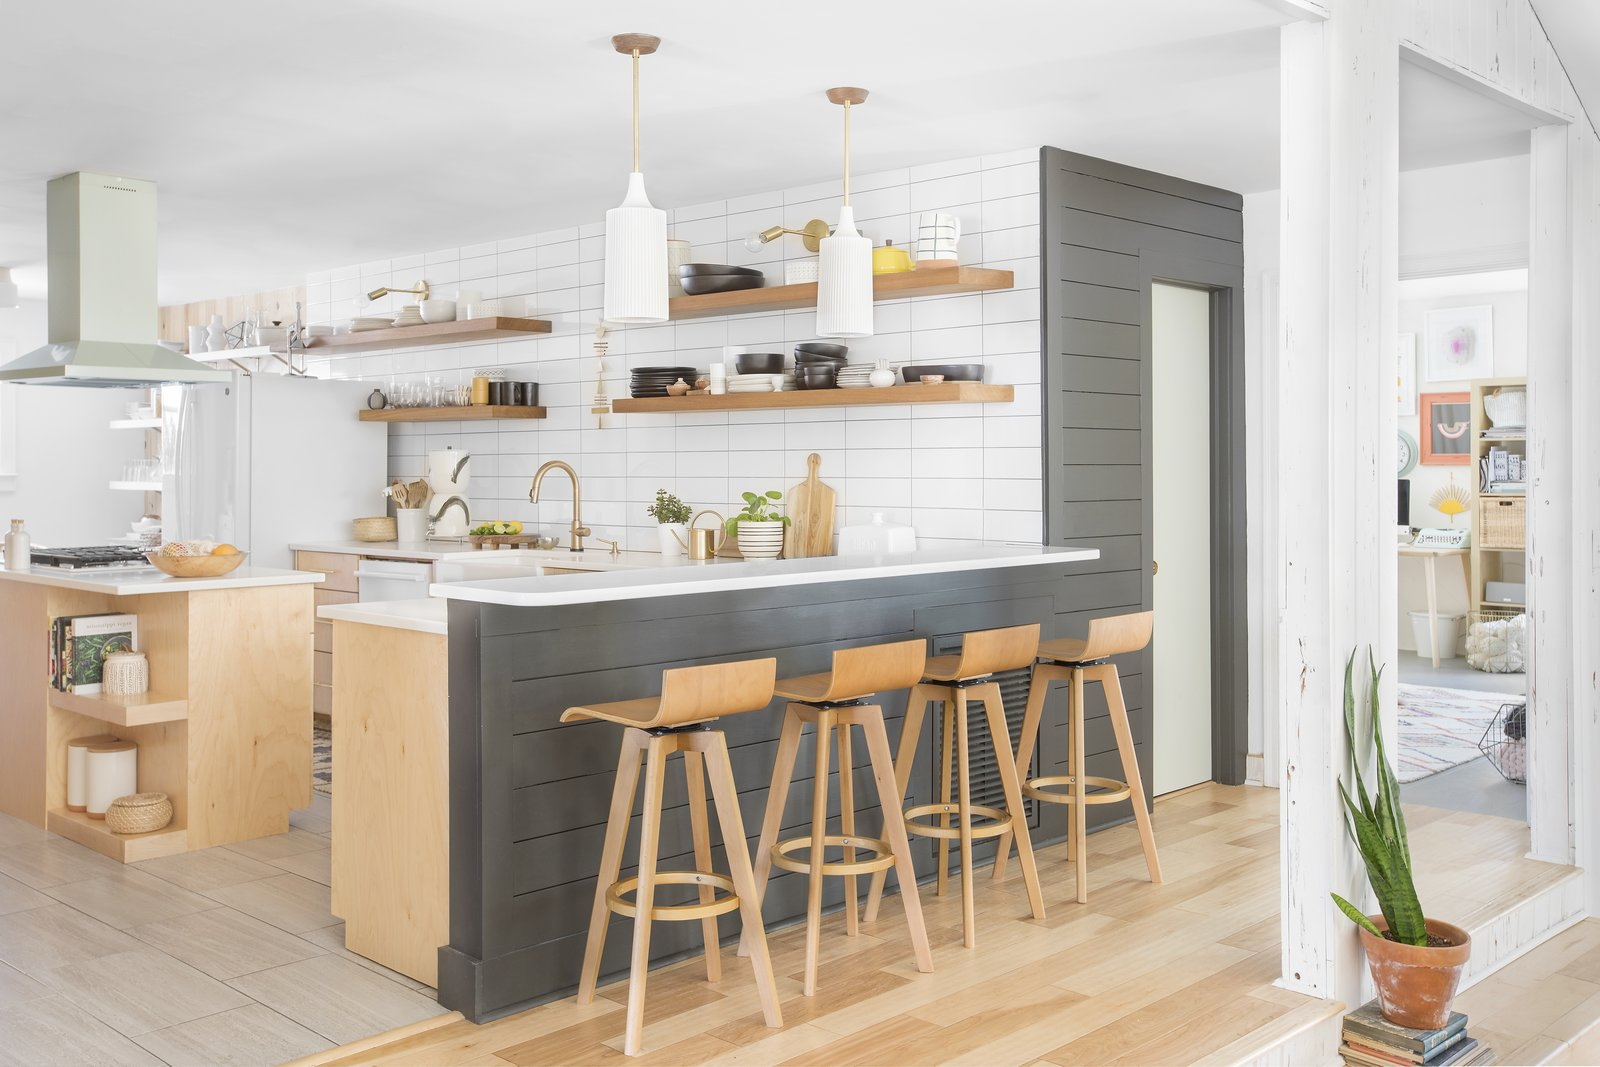 Sunwoven Studios Erin Barrett South Carolina home kitchen